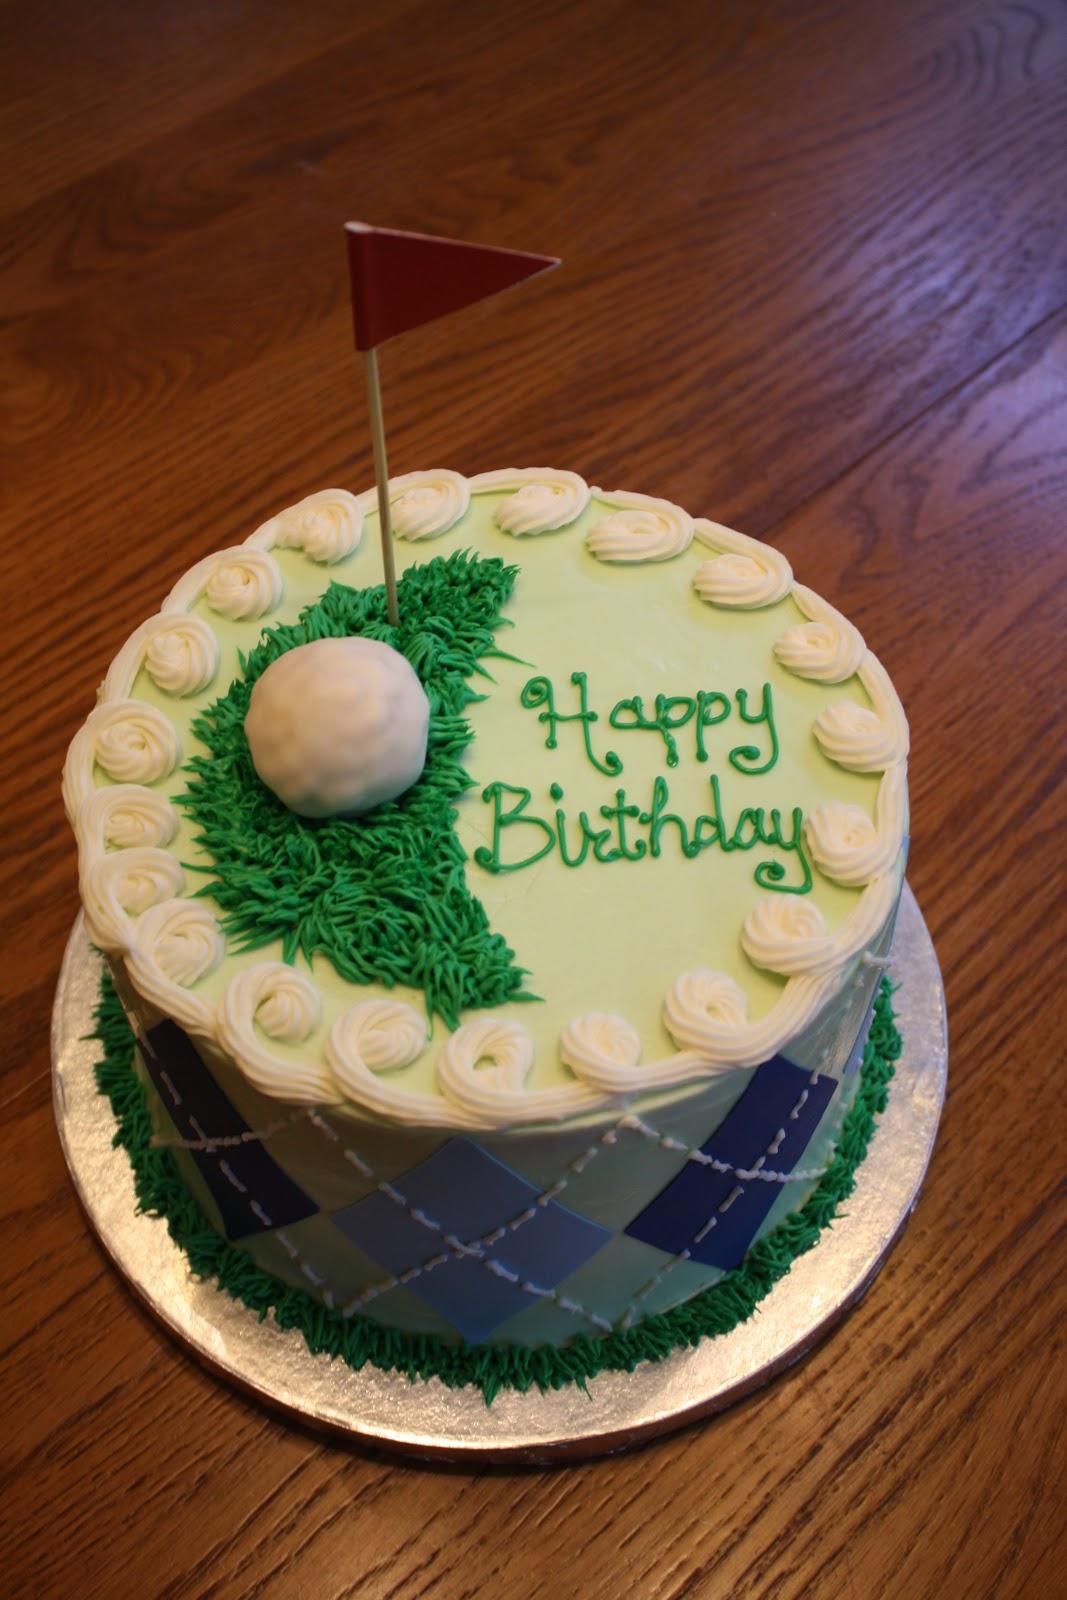 Cakes by Elizabeth June 2012 Golf Theme Birthday Cake